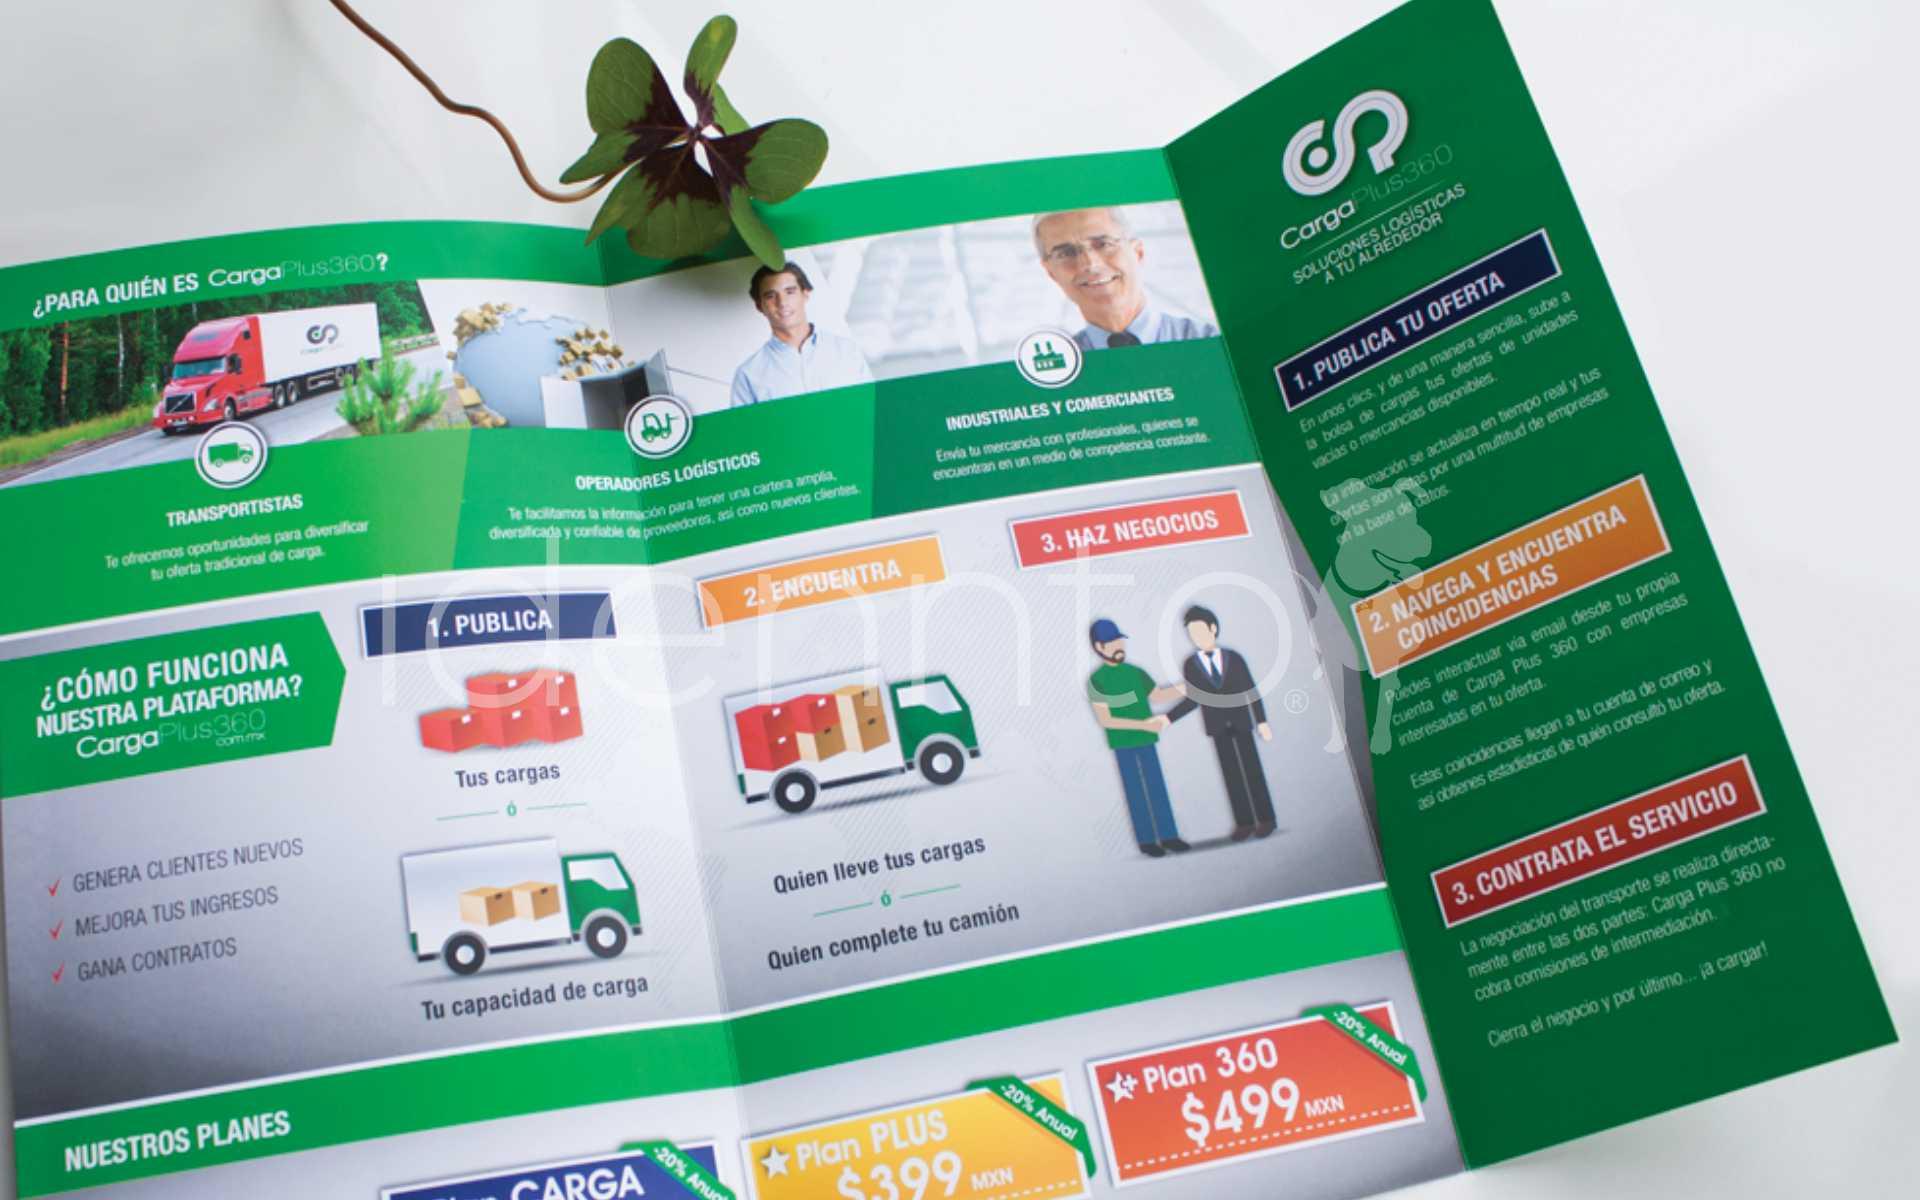 Publicidad Carga Plus 360